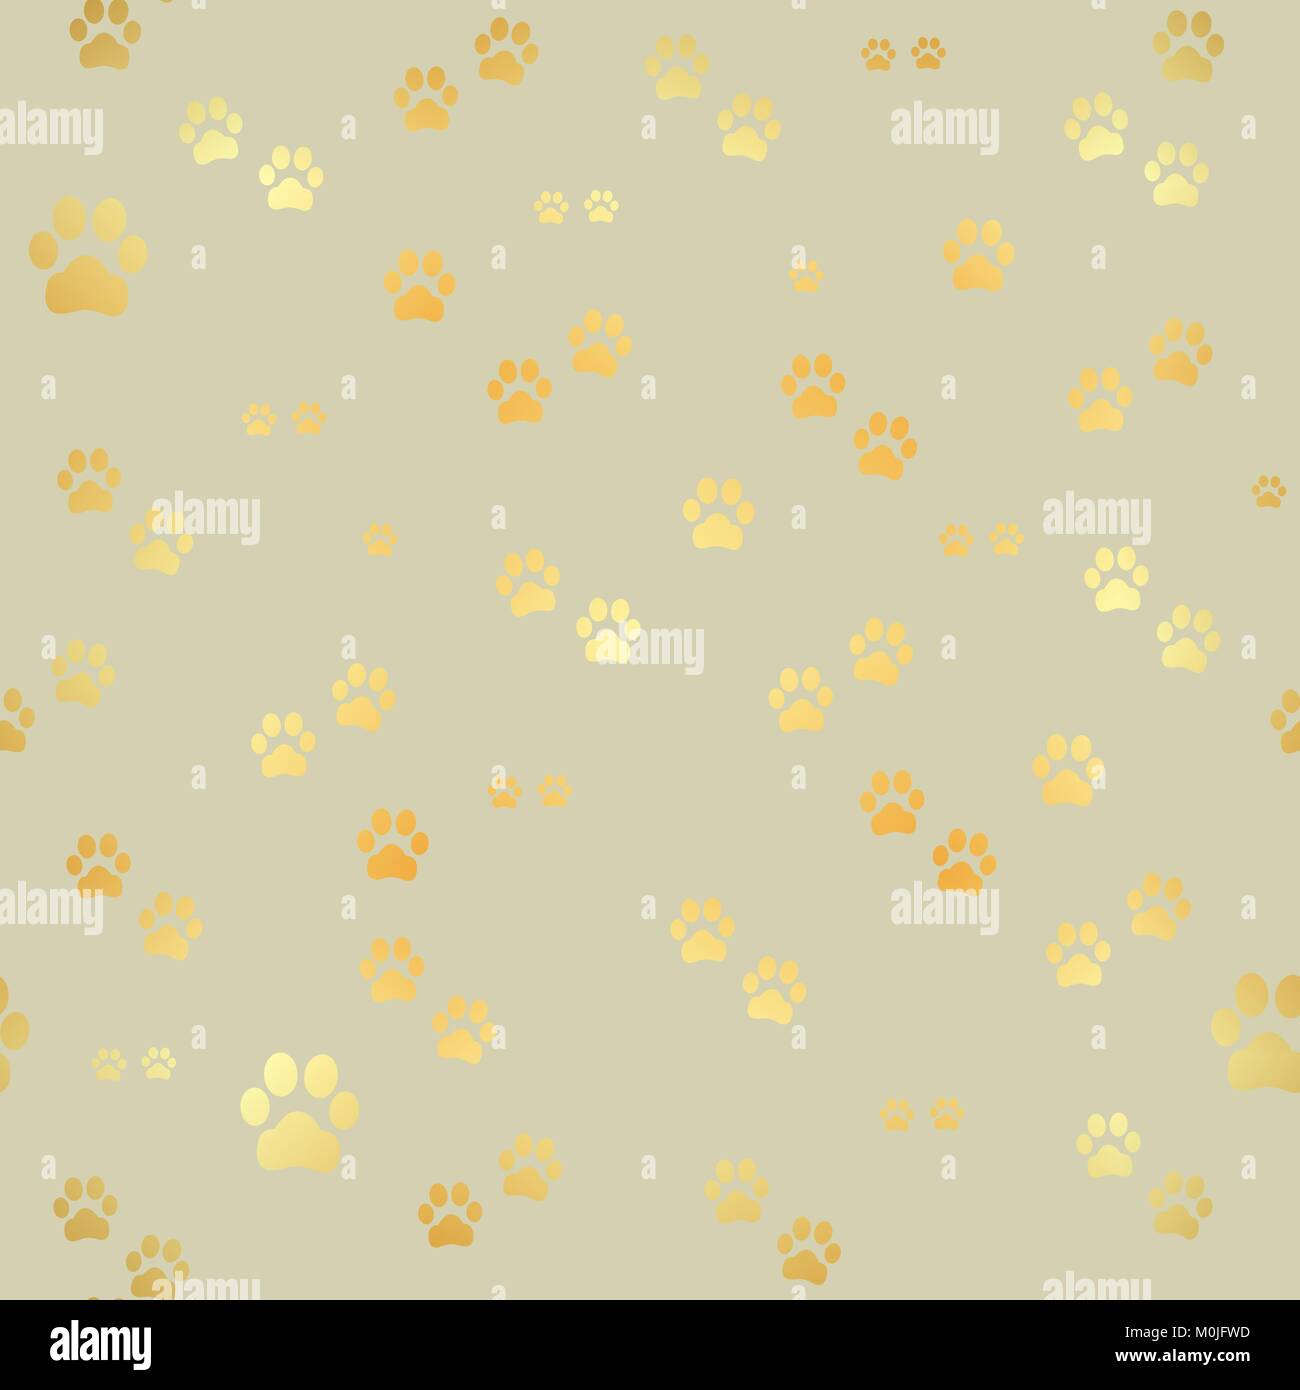 Dog Gold Paw Prints Seamless Pattern Of Animal Footprints Print